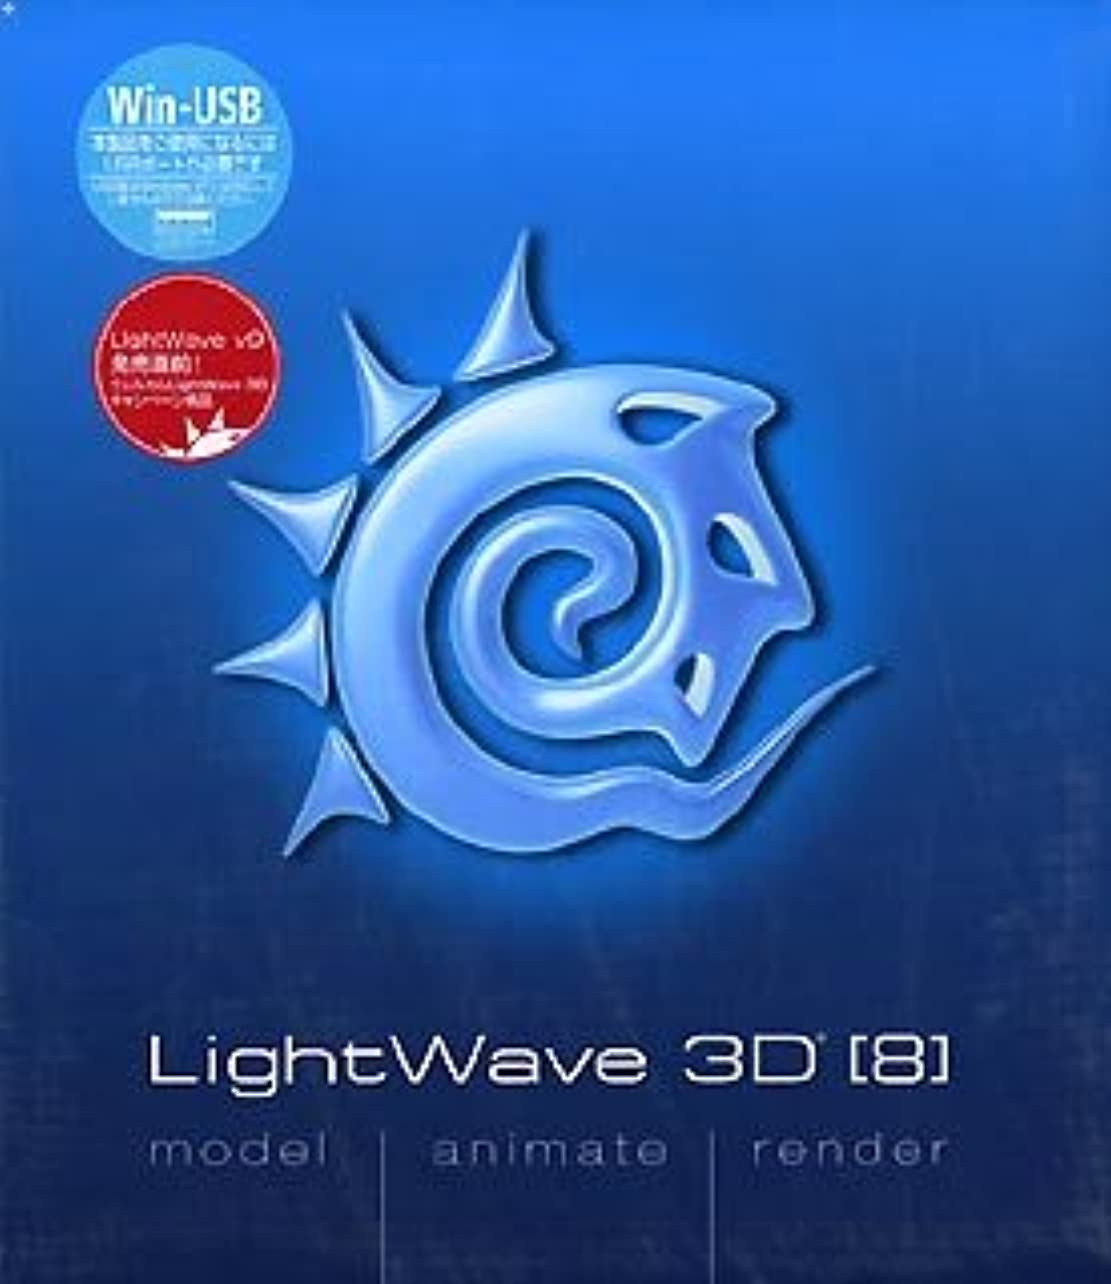 LightWave 3D [8] Win-USB 日本語版 (製本マニュアル) LW9 無償ダウンロード権利付